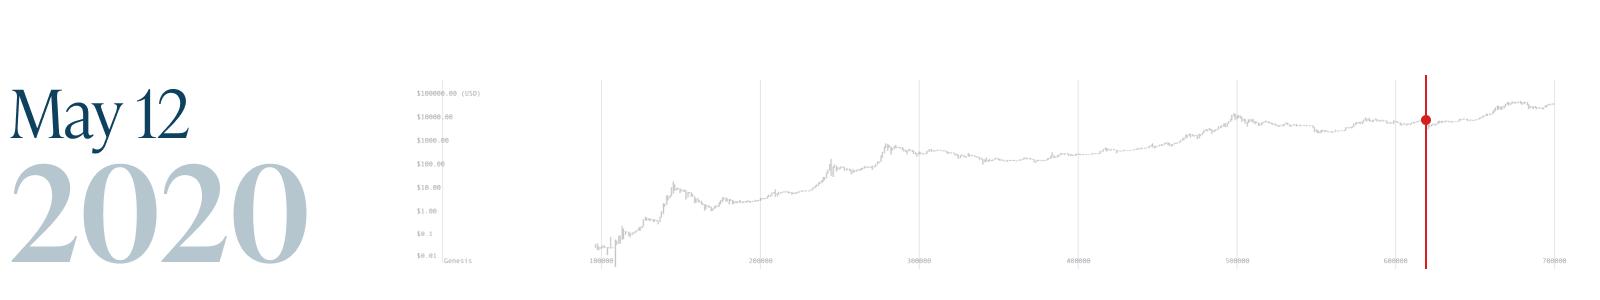 Monochrome_Bitcoin Block 700k_12 May 2020.png